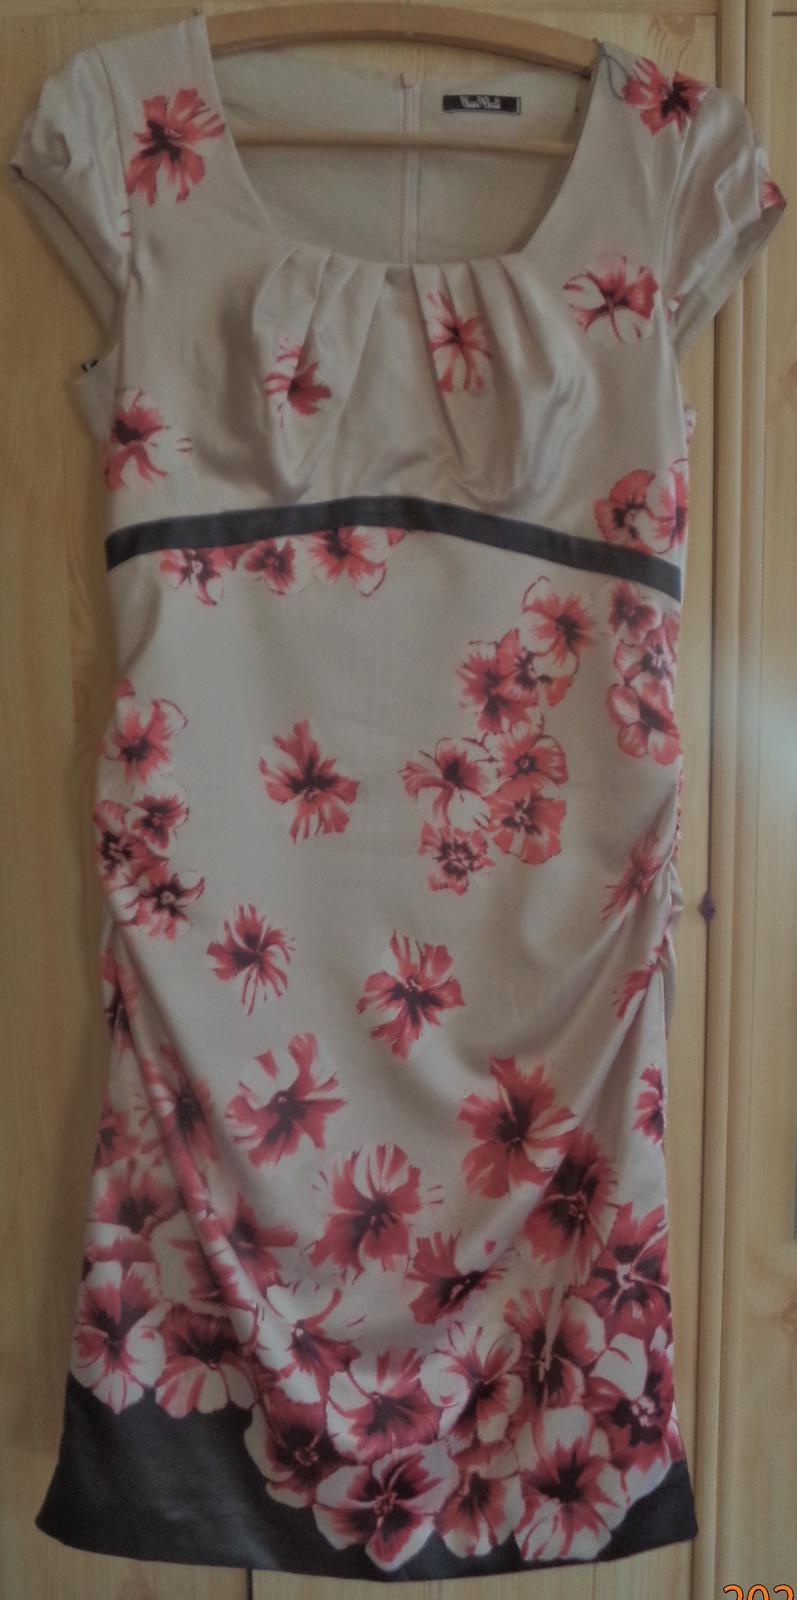 Vera Mont tehotenske šaty - Obrázok č. 1